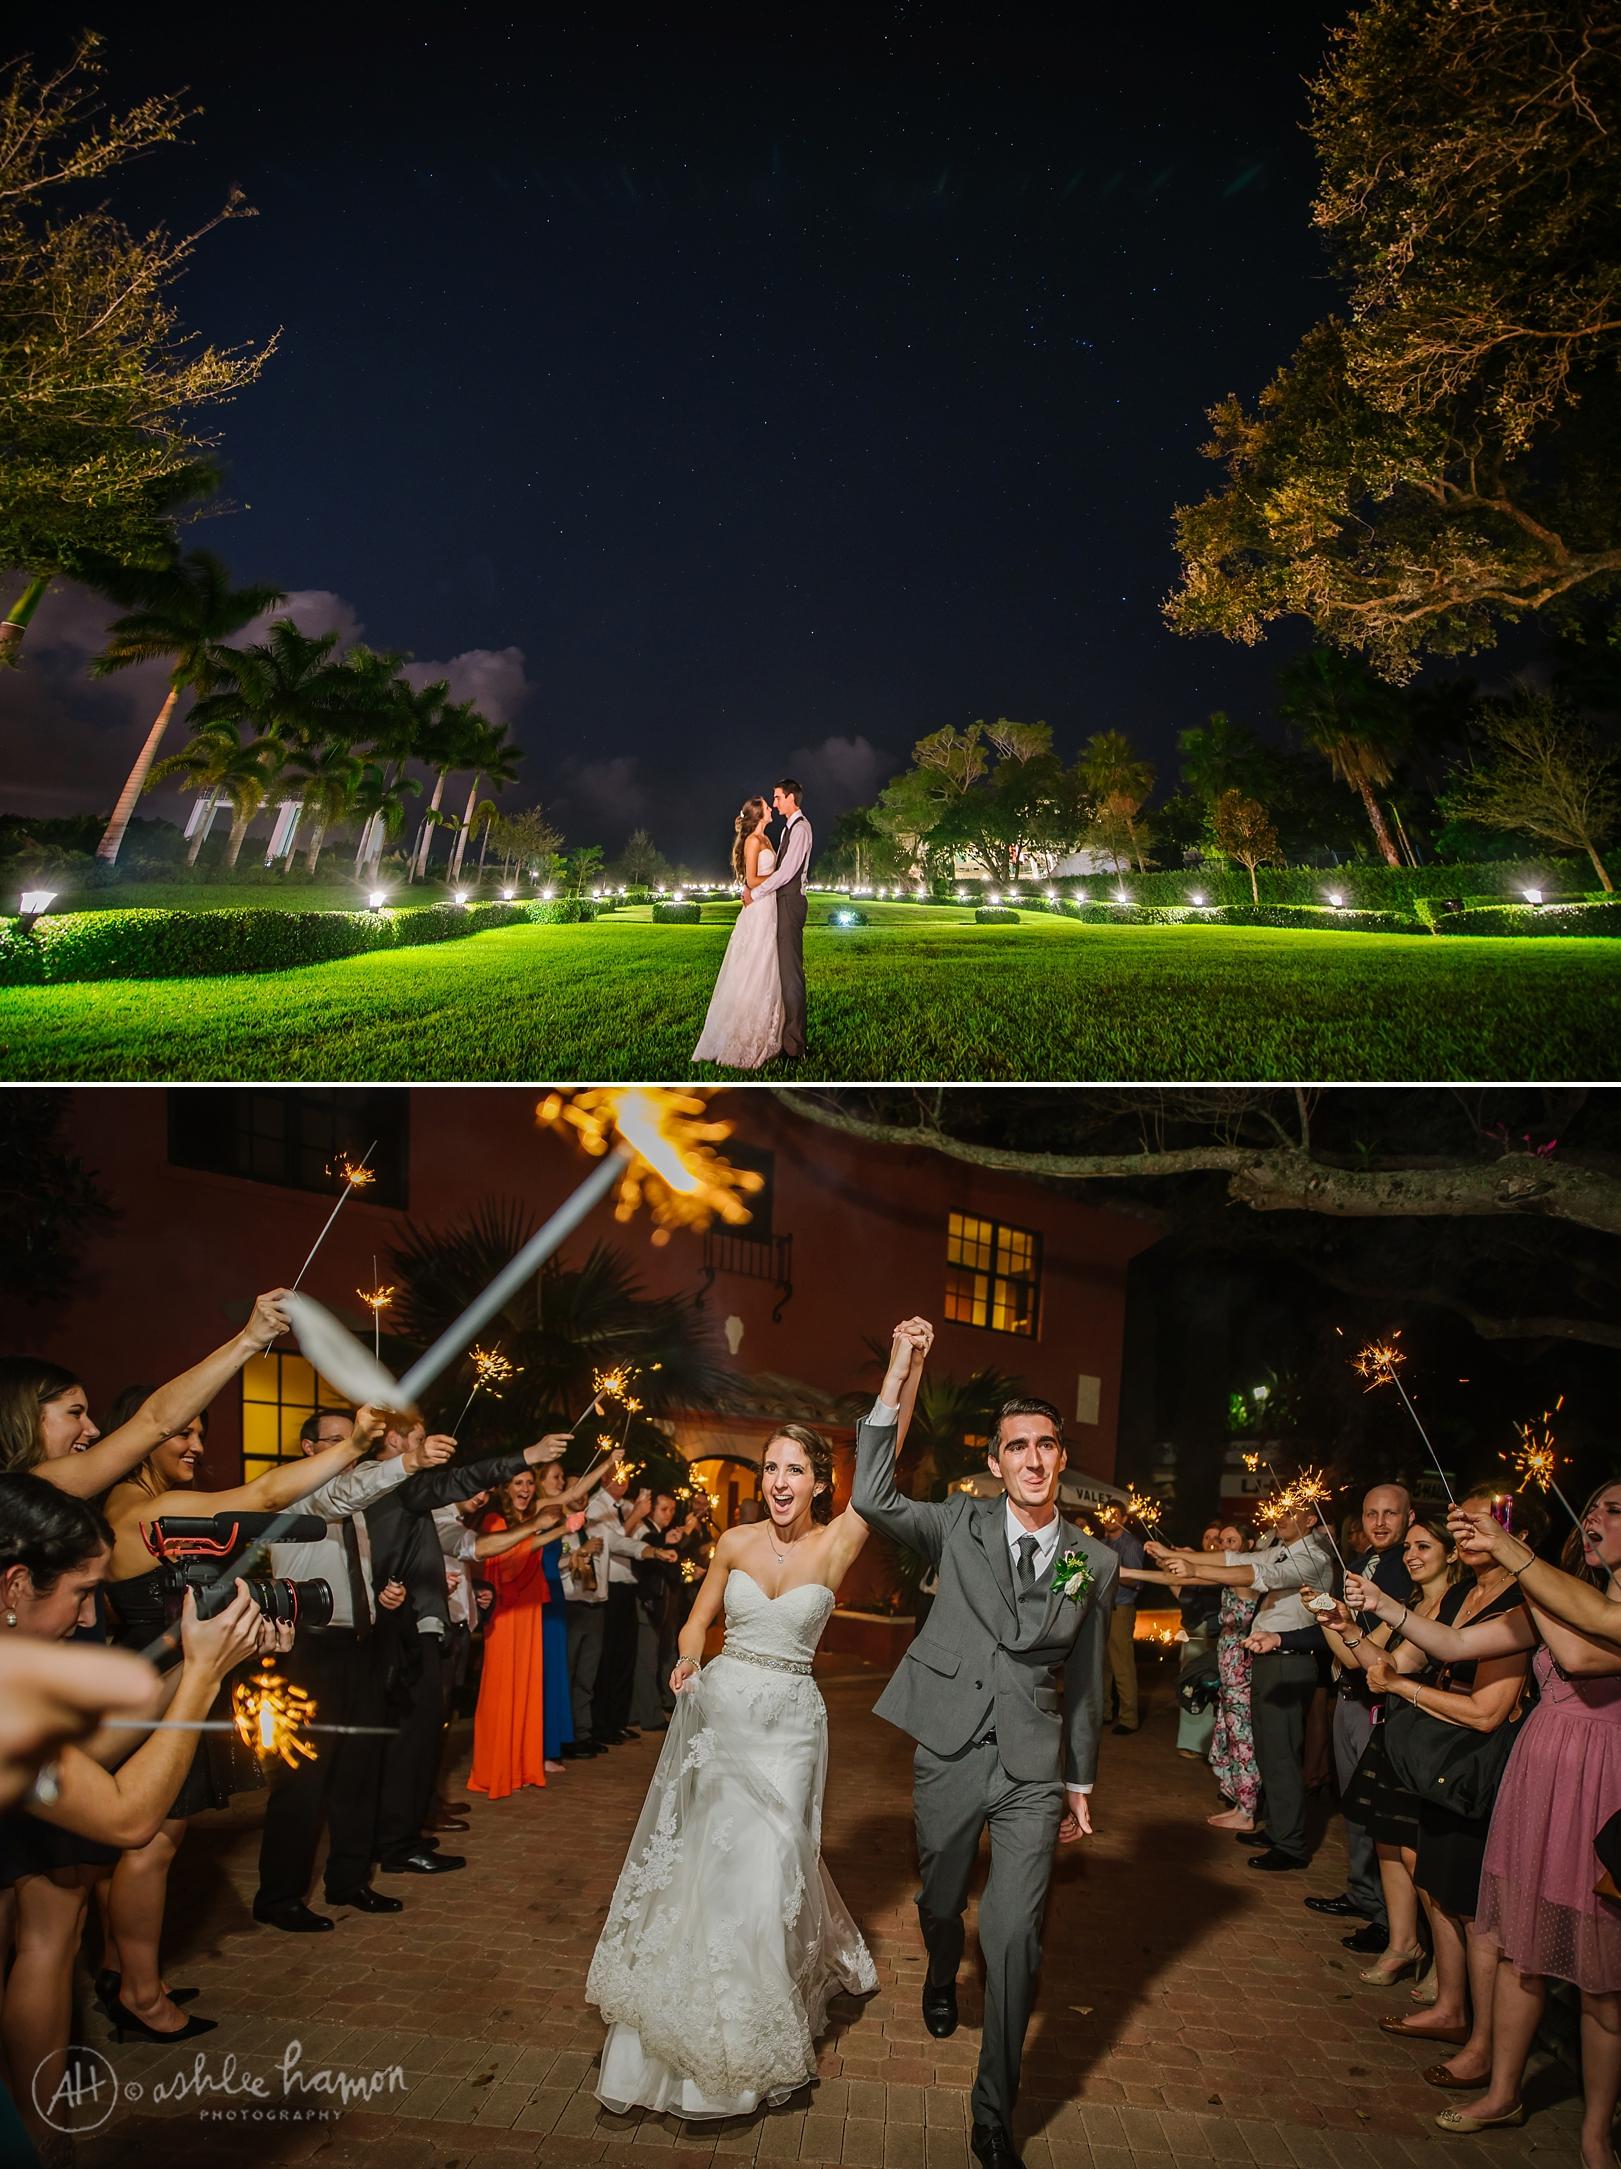 miami-wedding-photography-ashlee-hamon-elegant-vintage-antique-wedding_0032.jpg